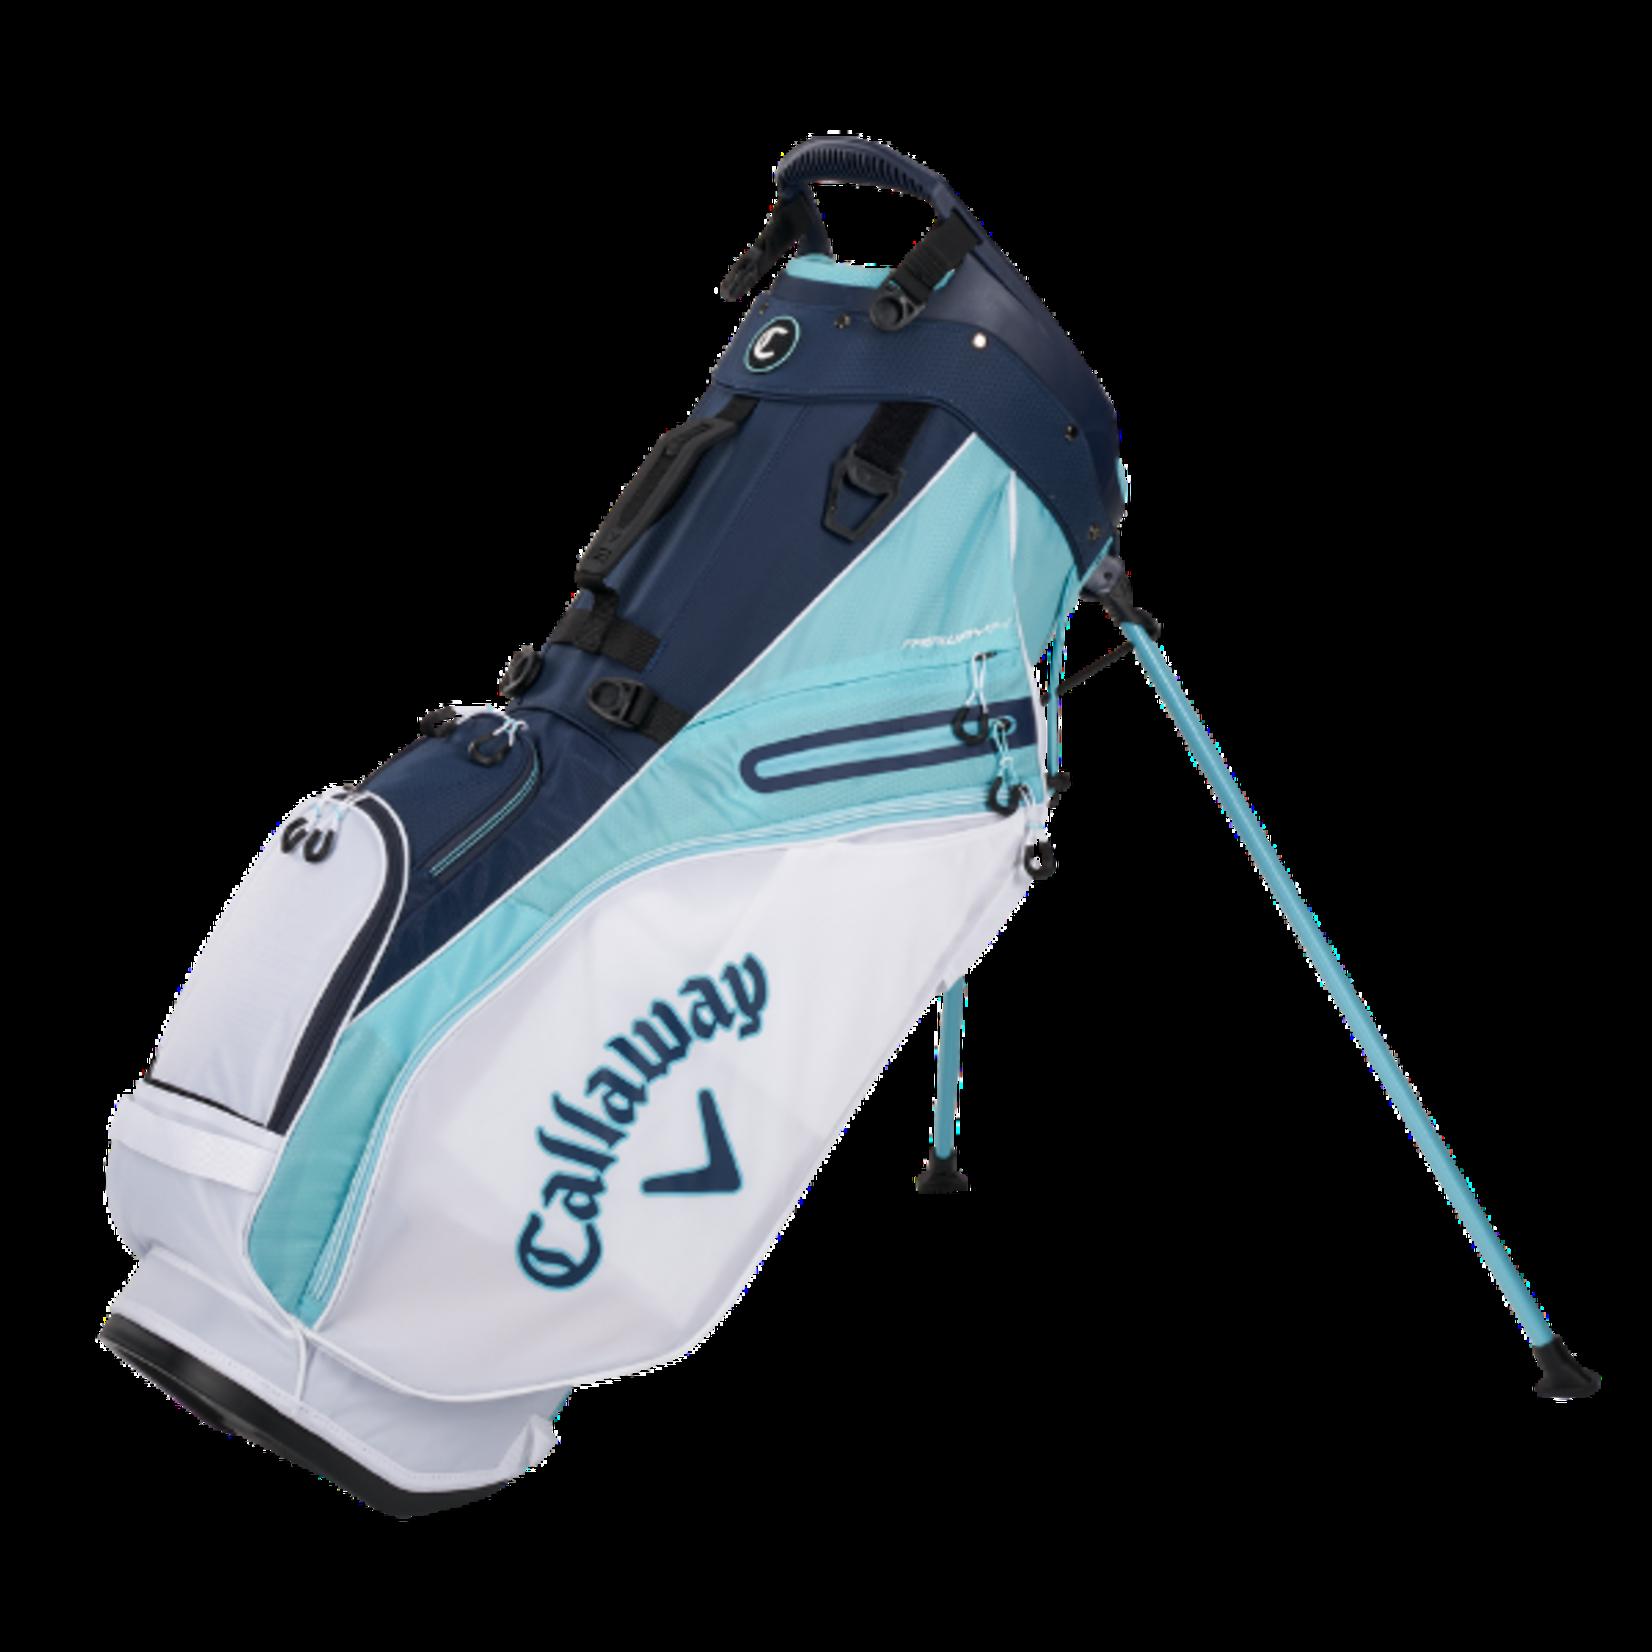 Callaway Callaway Stand Bag Epic Fairway 14 '21